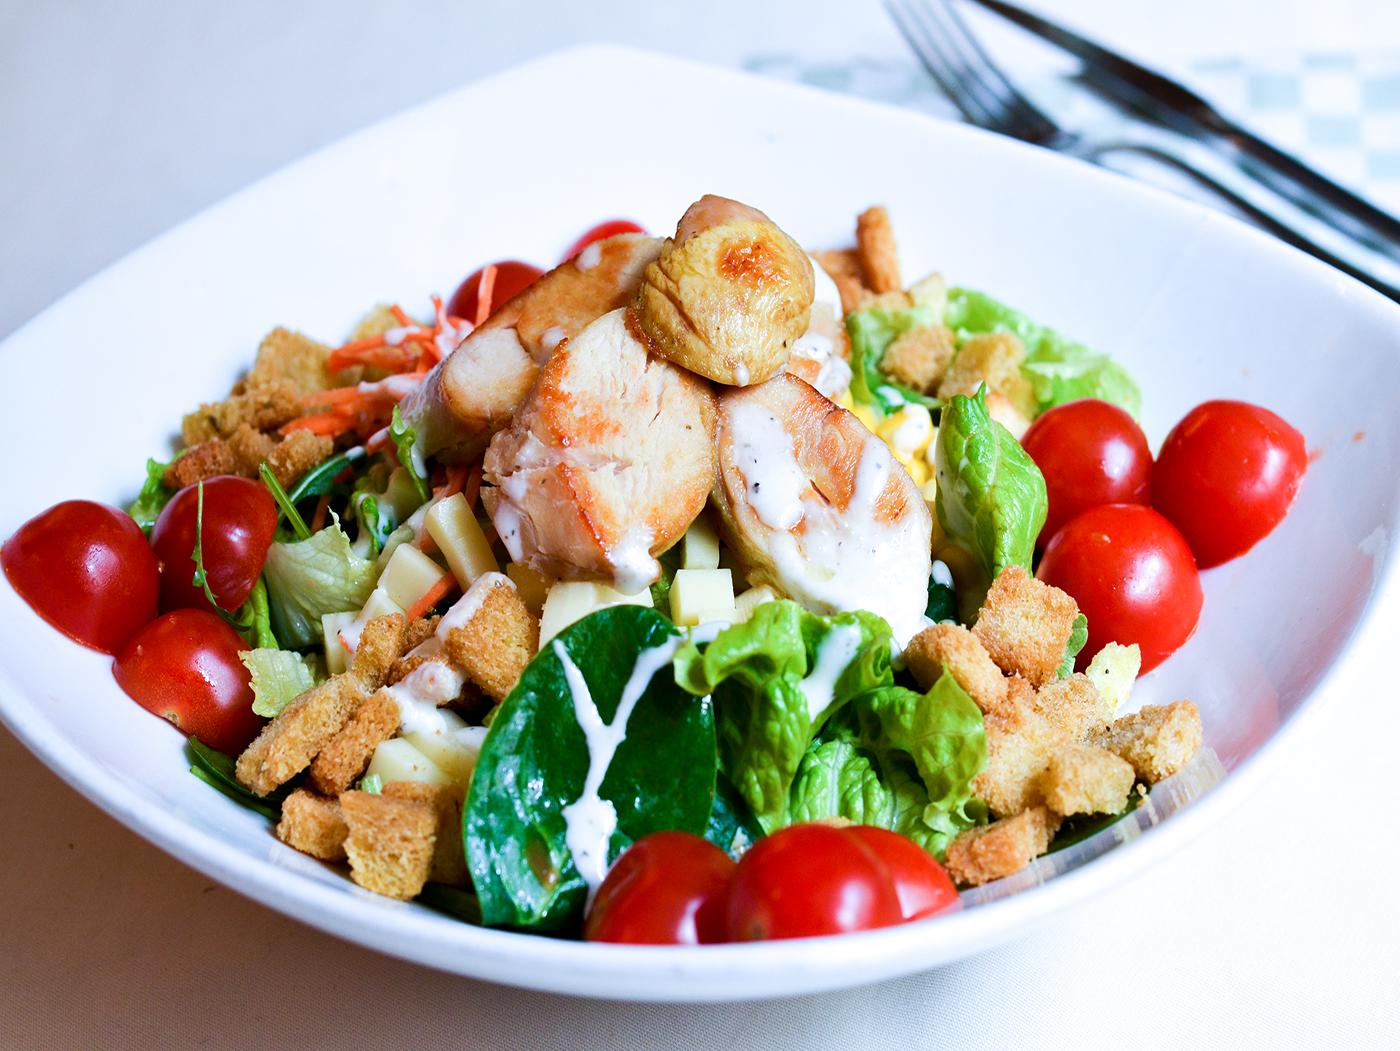 Dolomiti salad